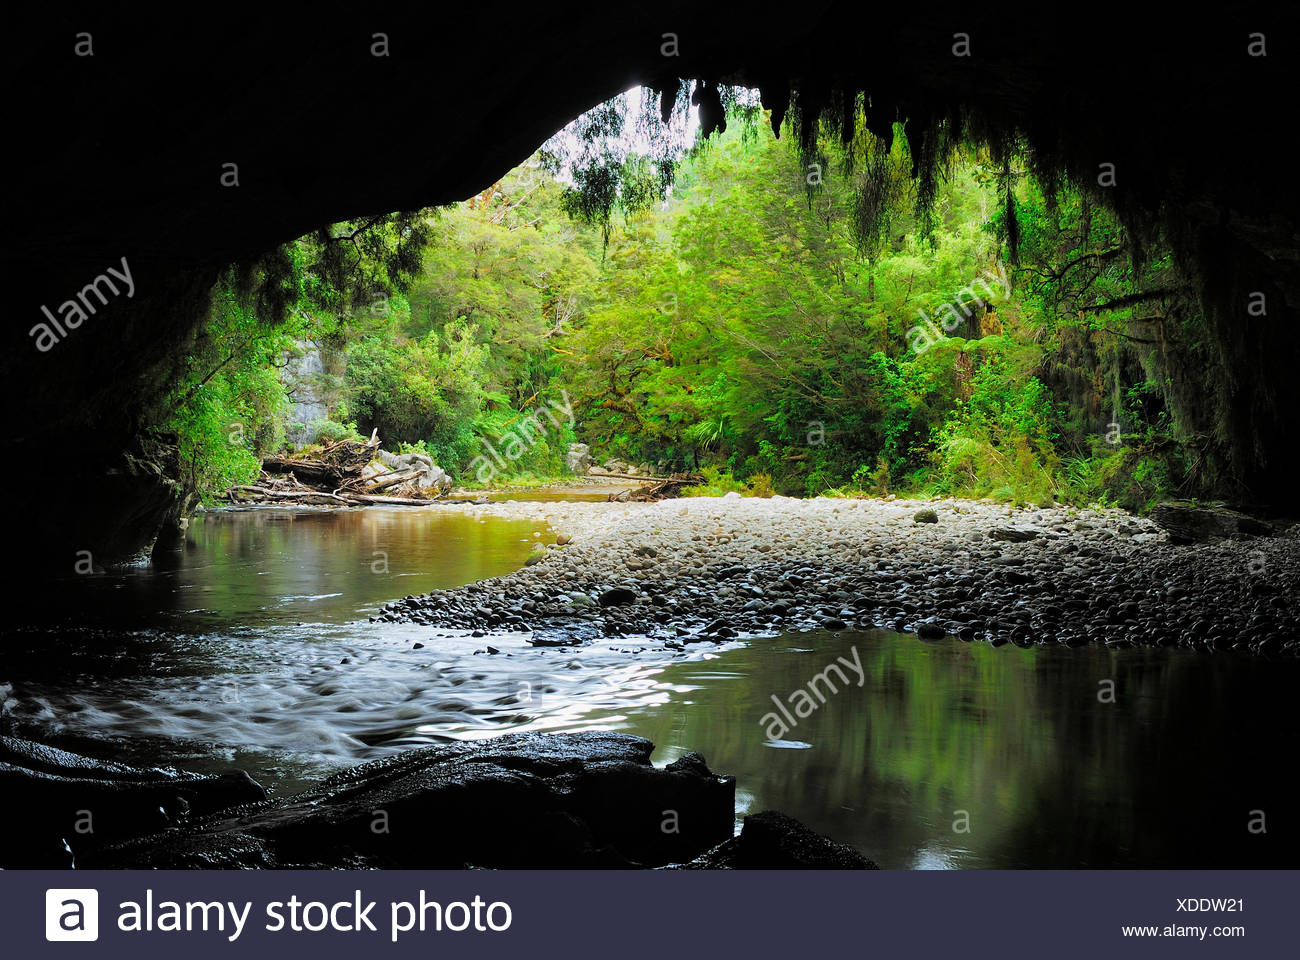 Moria Gate Arch and Oparara River, New Zealand, Southern Island, Kahurangi National Park, Oparara Basin Stock Photo